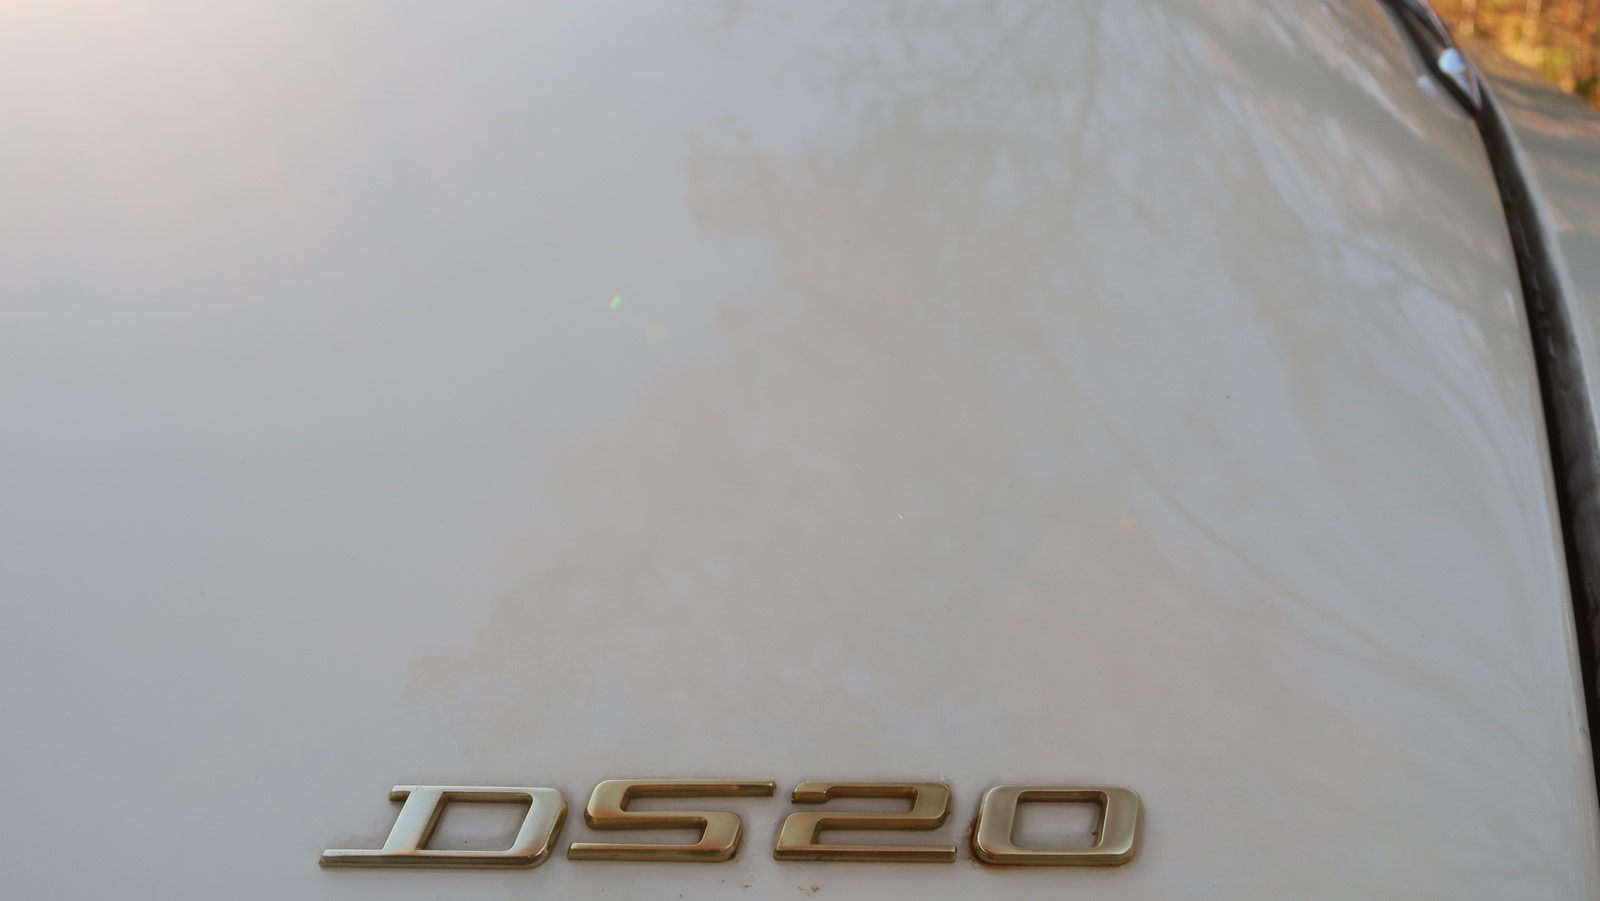 Citroen DS 20 Pallas 1969 TA FM 2018 14